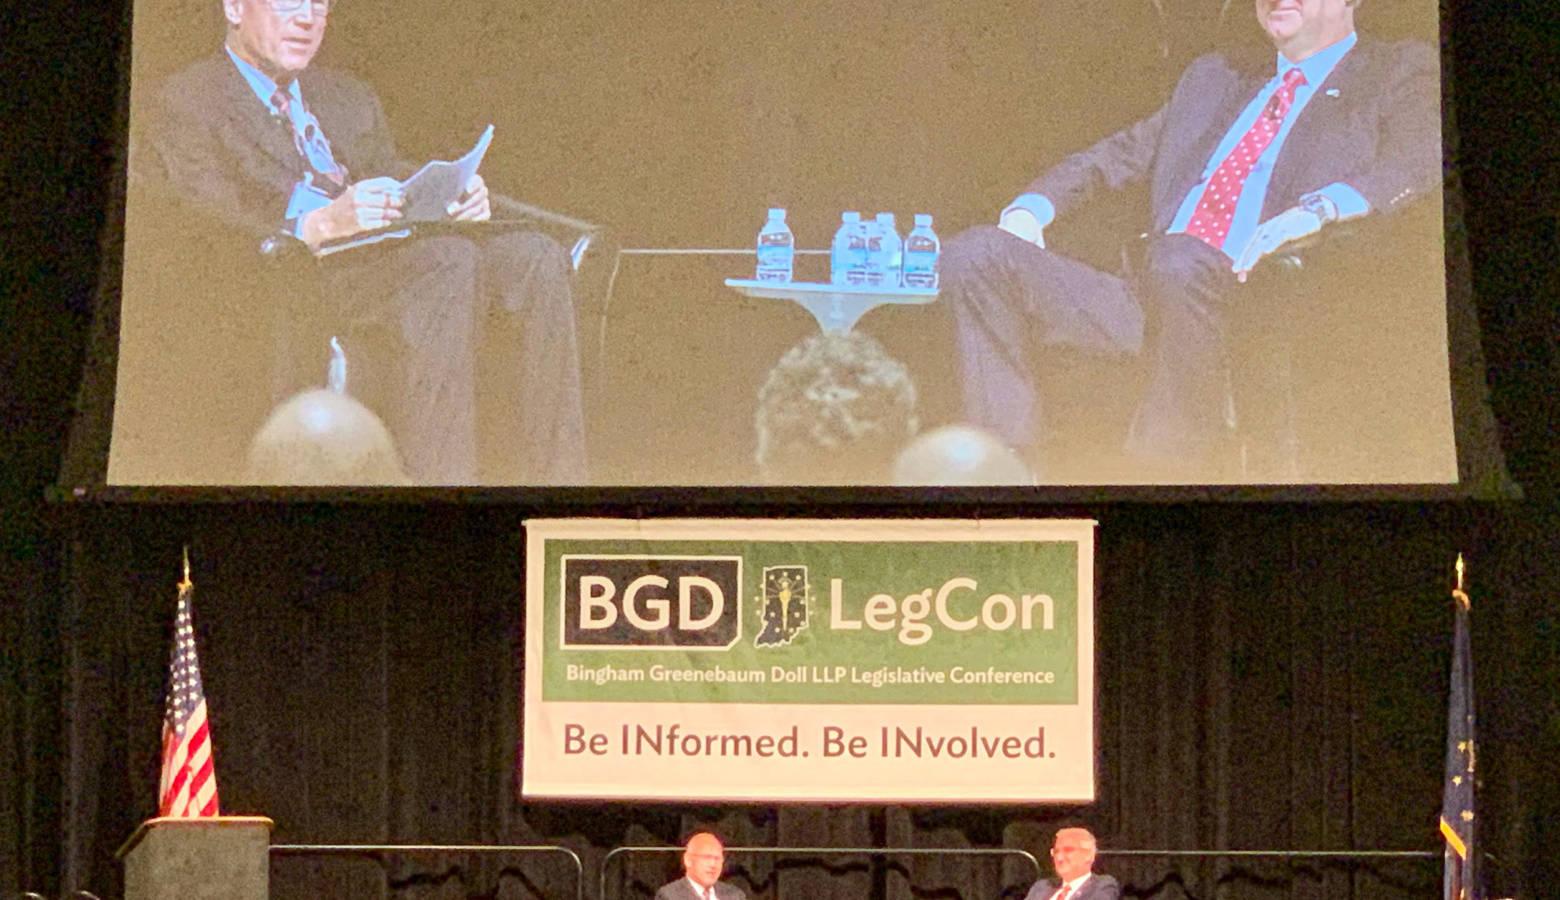 Gov. Eric Holcomb, right, speaks at the 2019 Bingham Greenebaum Doll Legislative Conference. (Brandon Smith/IPB News)